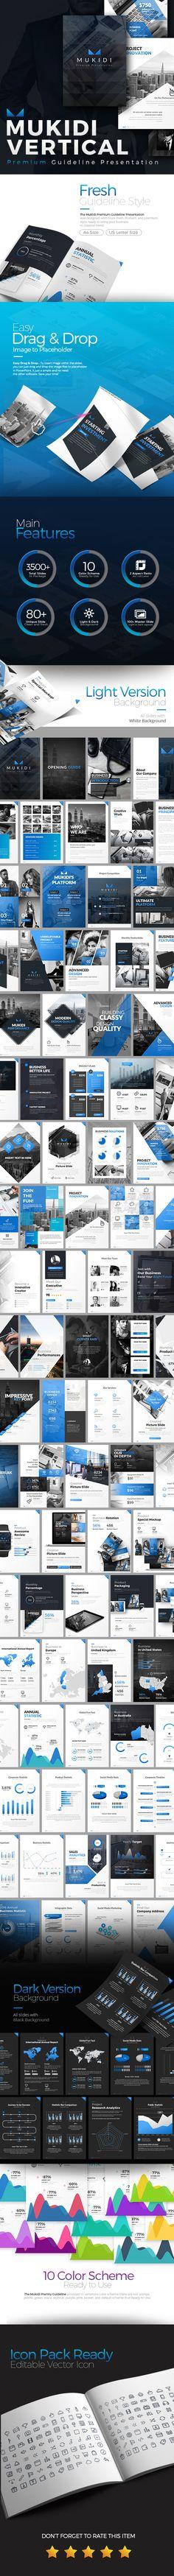 Mukidi Vertical Premium PowerPoint Presentation Template